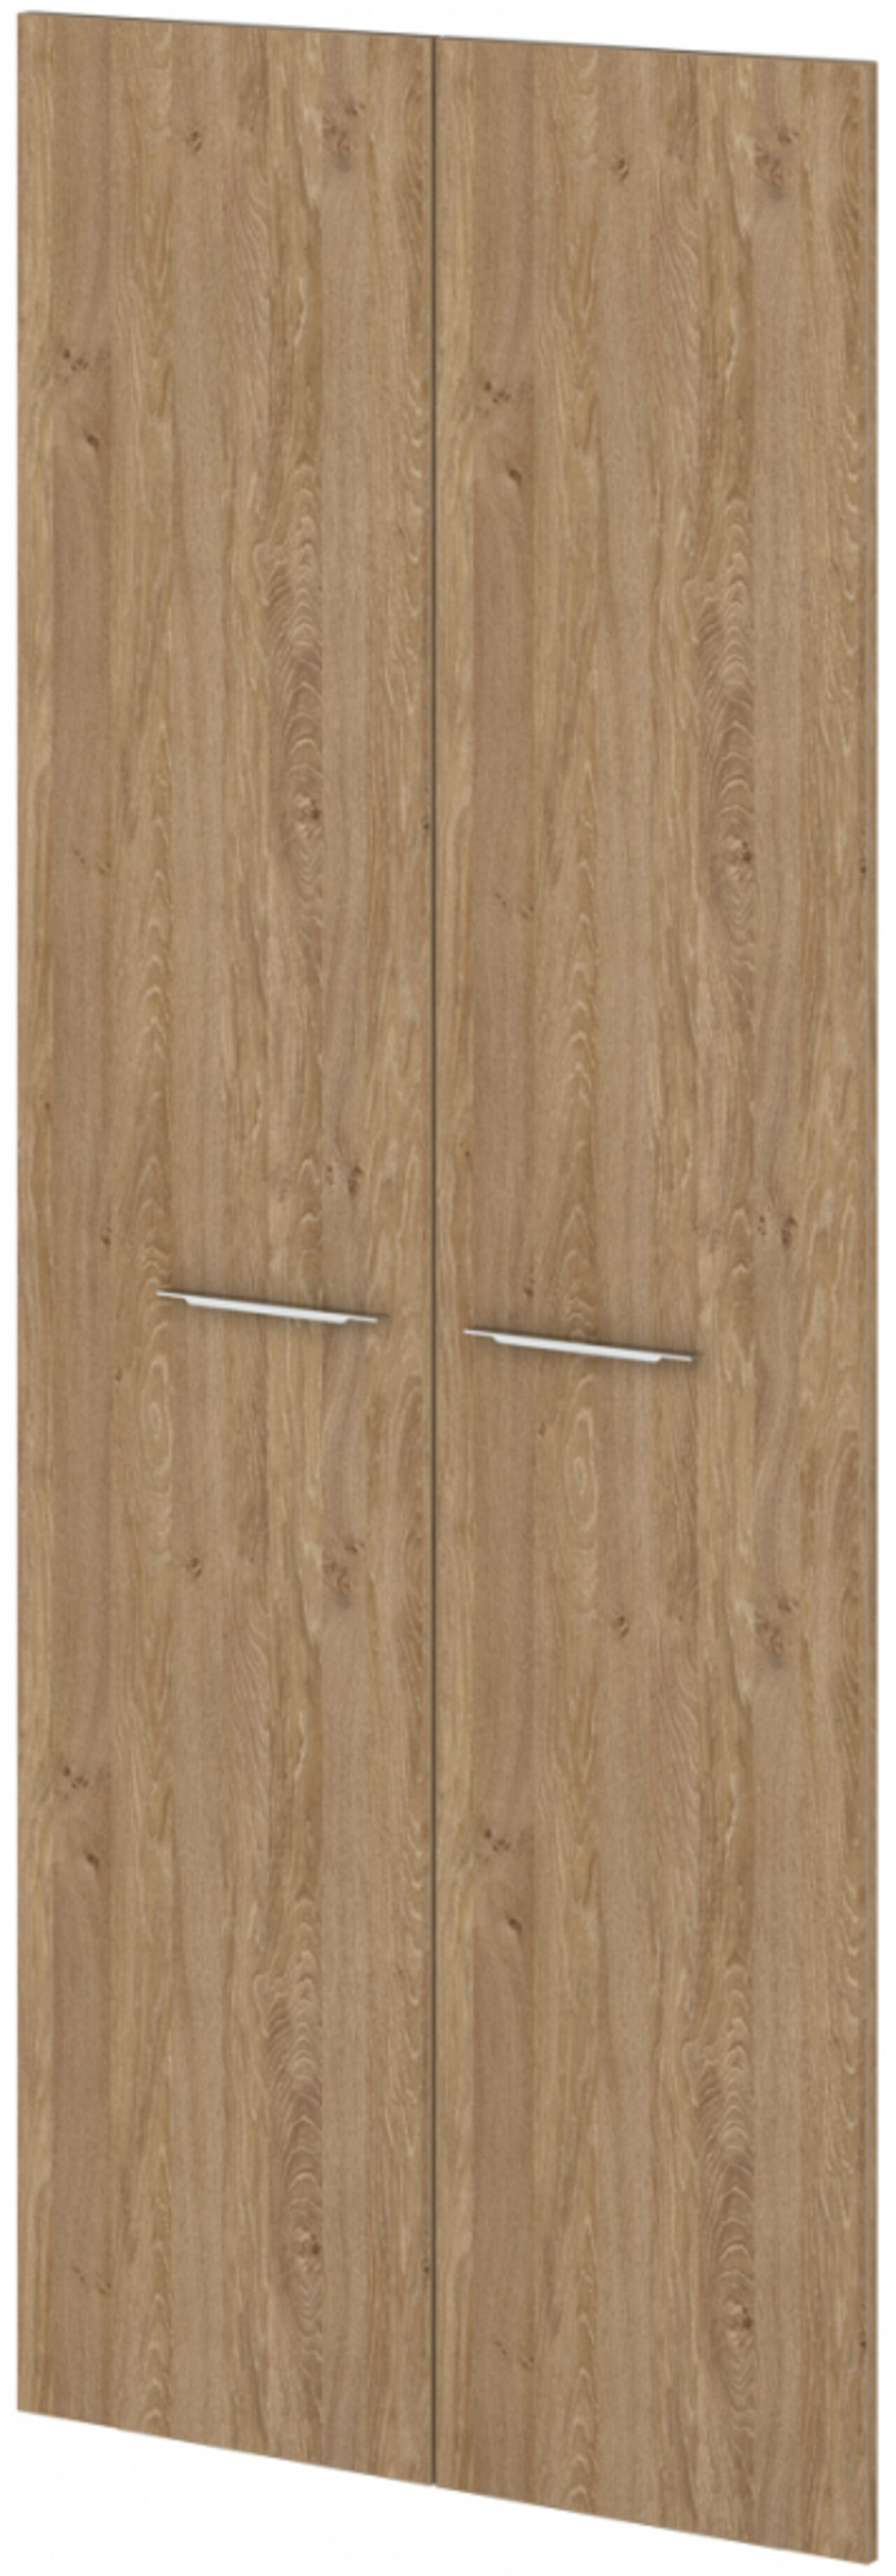 Двери ЛДСП высокие  Grandeza 2x90x221 - фото 2